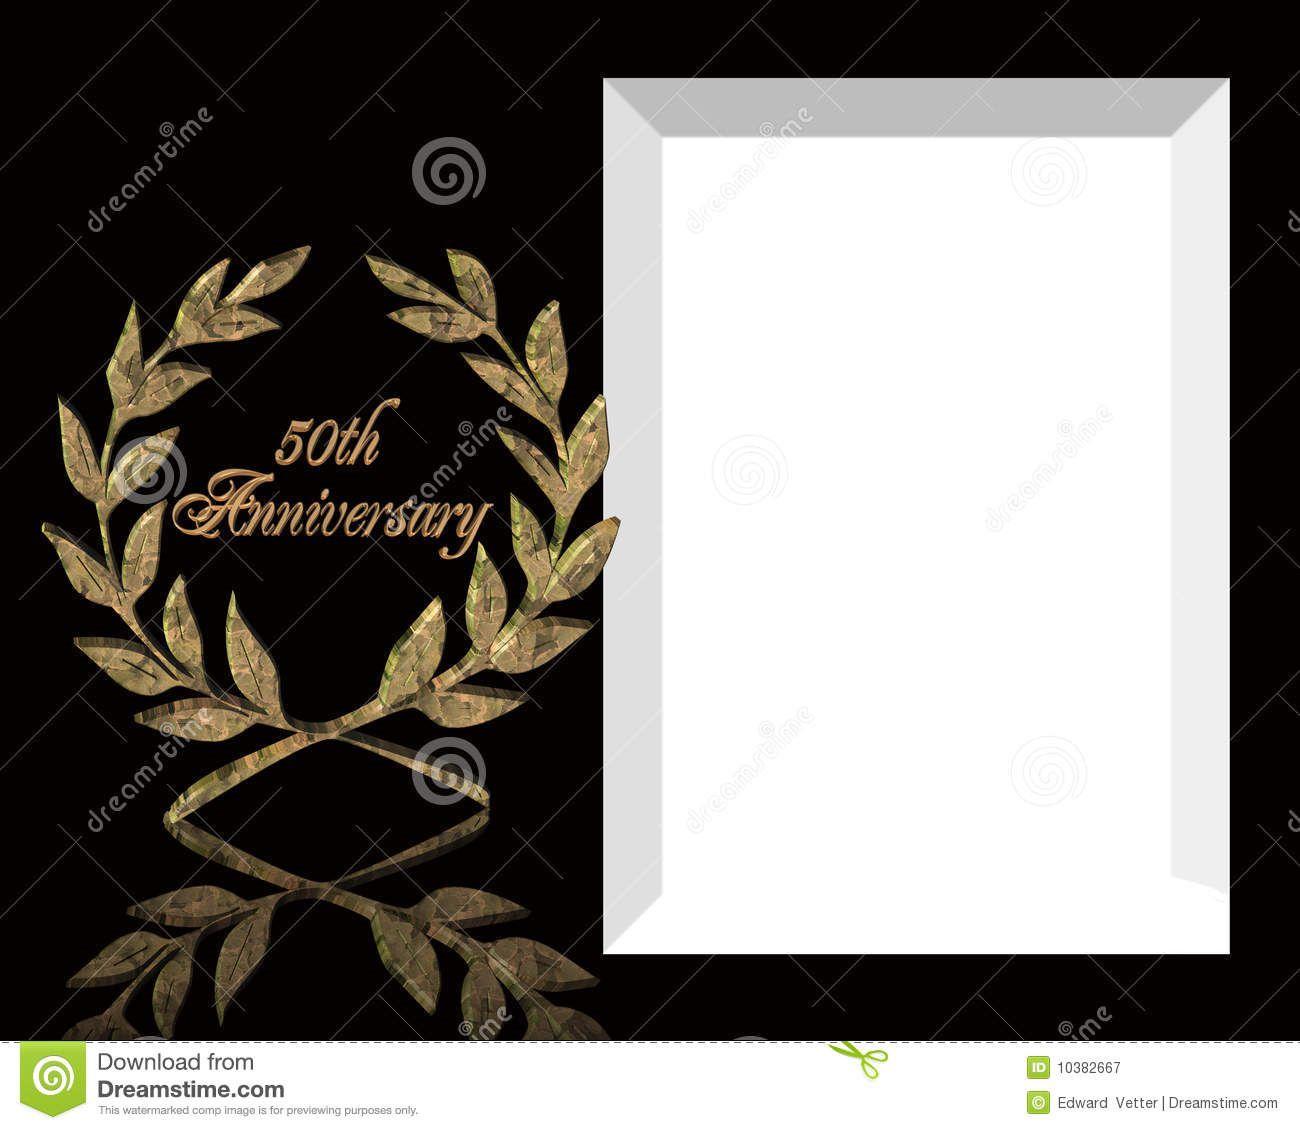 005 Beautiful 50th Anniversary Party Invitation Template Inspiration  Templates Golden Wedding Uk Microsoft Word FreeFull